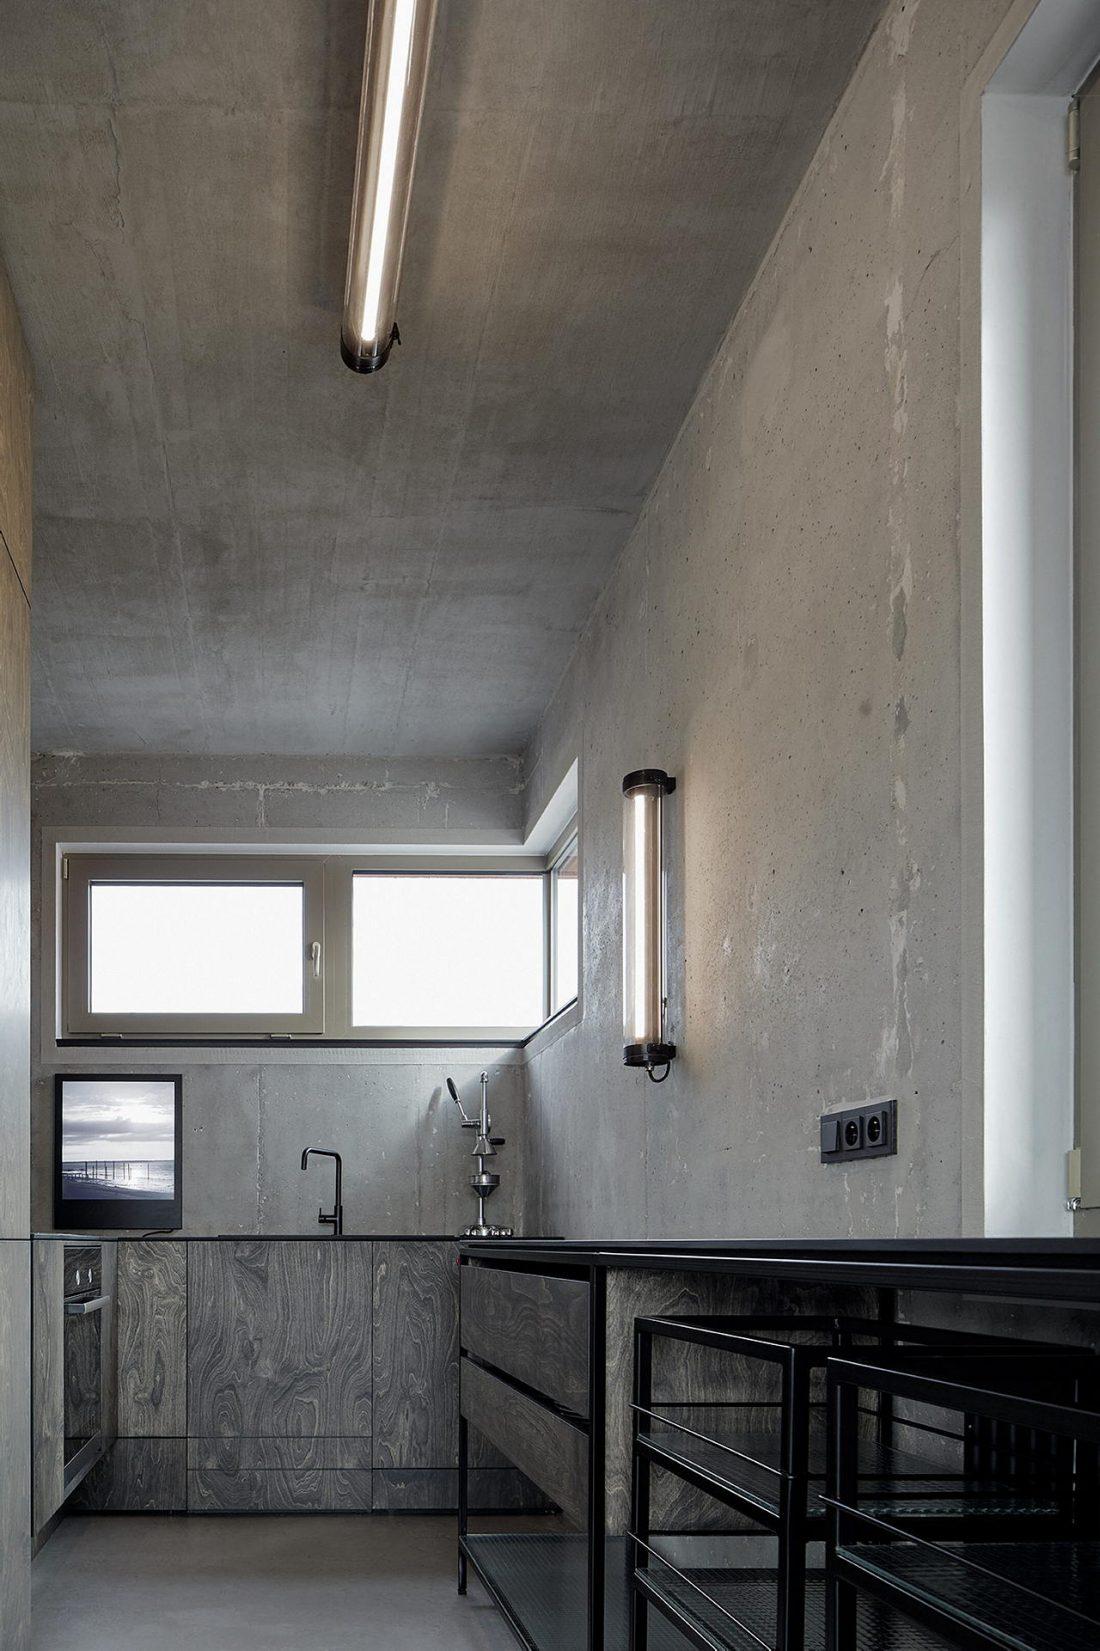 Дизайн интерьера квартиры в стиле лофт 44